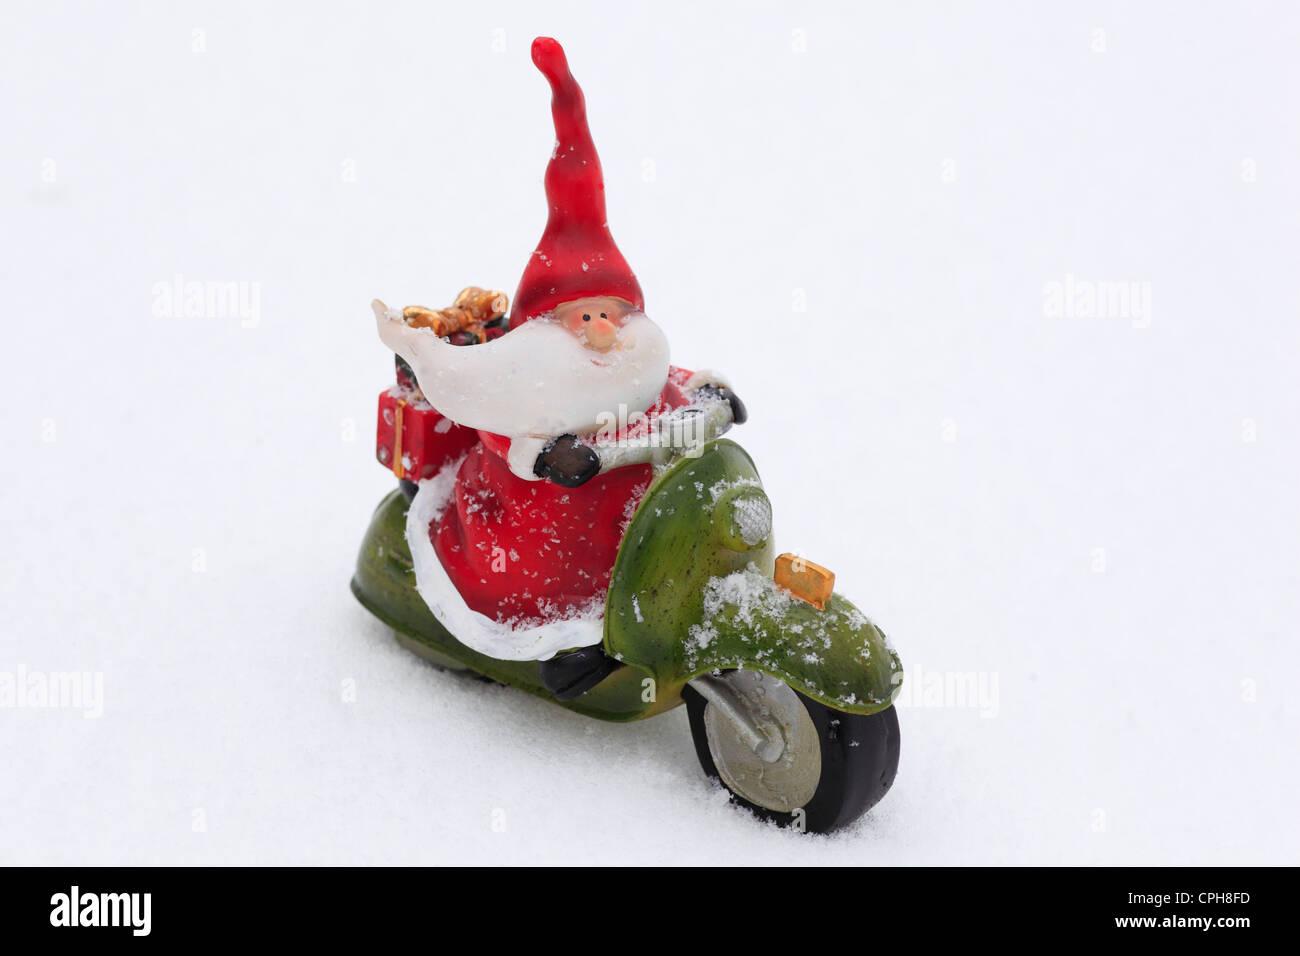 1, beard, whiskers, Santa, Santa Claus, decoration, figure, present,  presents, gift parcel, parcel, speed, caricature, cold, man